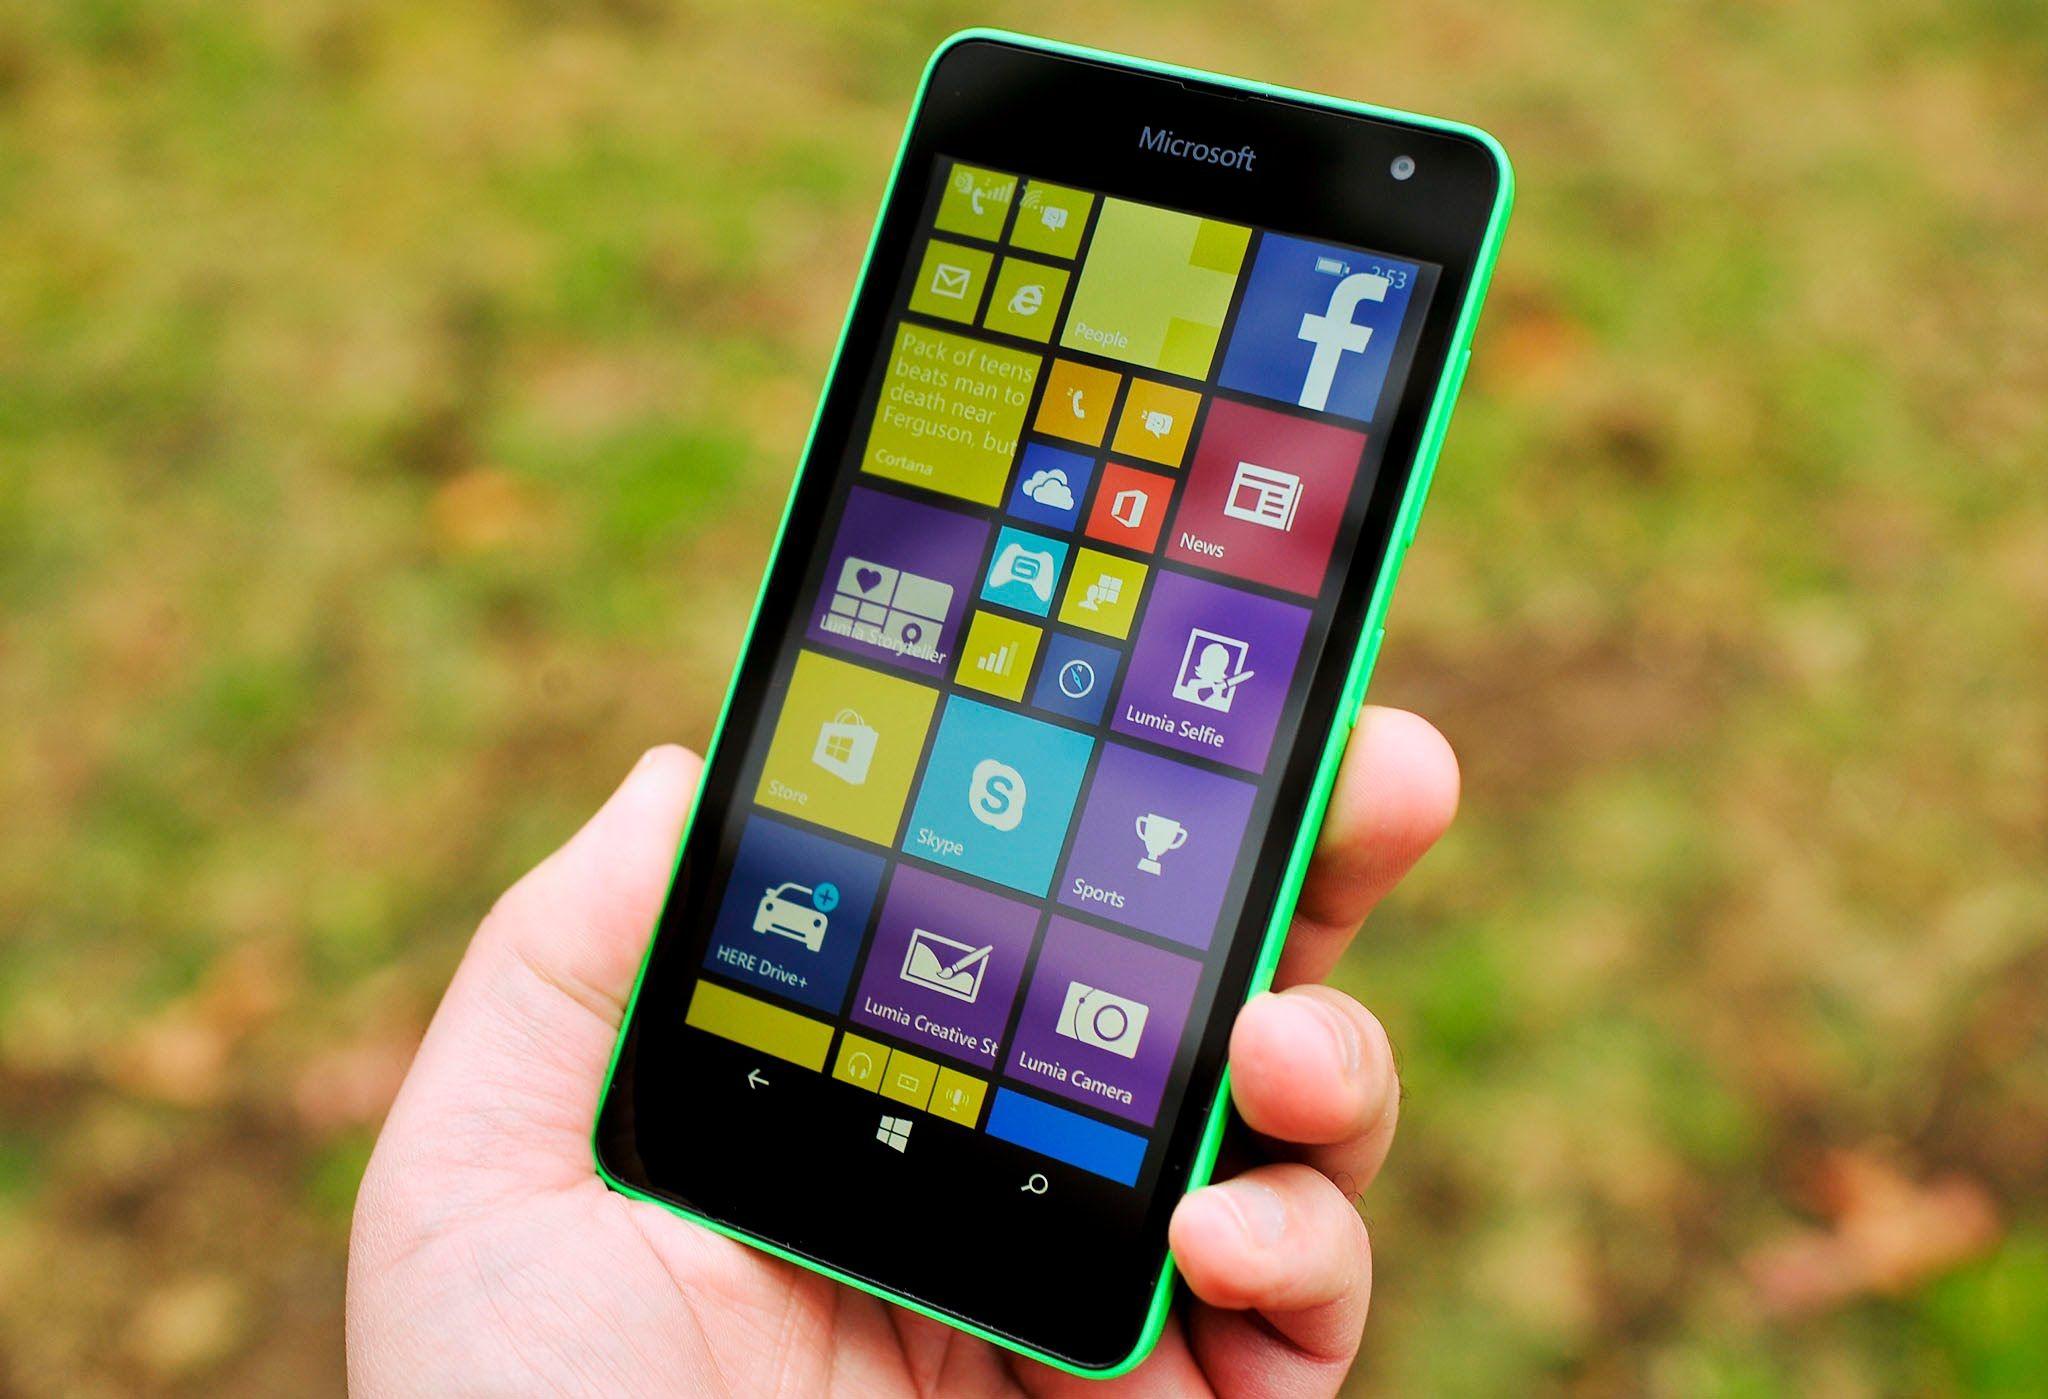 Microsoft Lumia 535 tour and first impressions